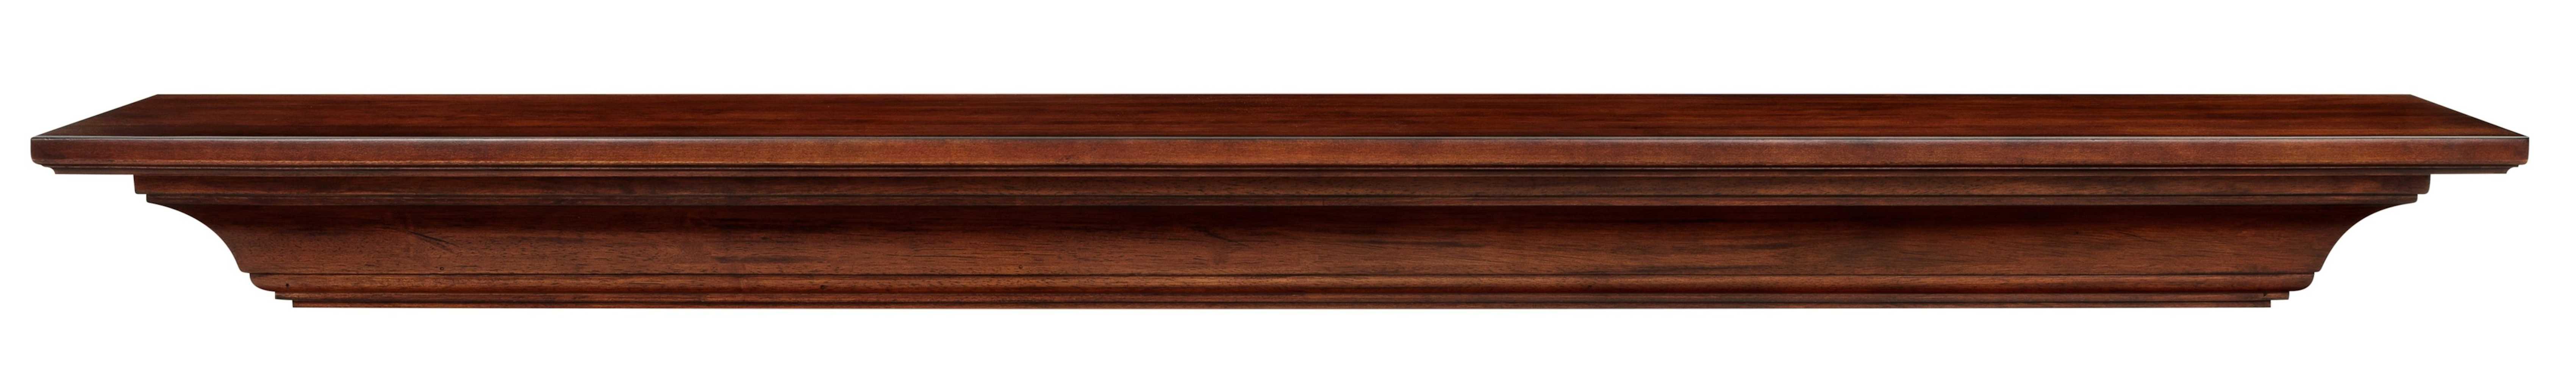 "60"" Elegant Antique Wood Mantel Shelf"